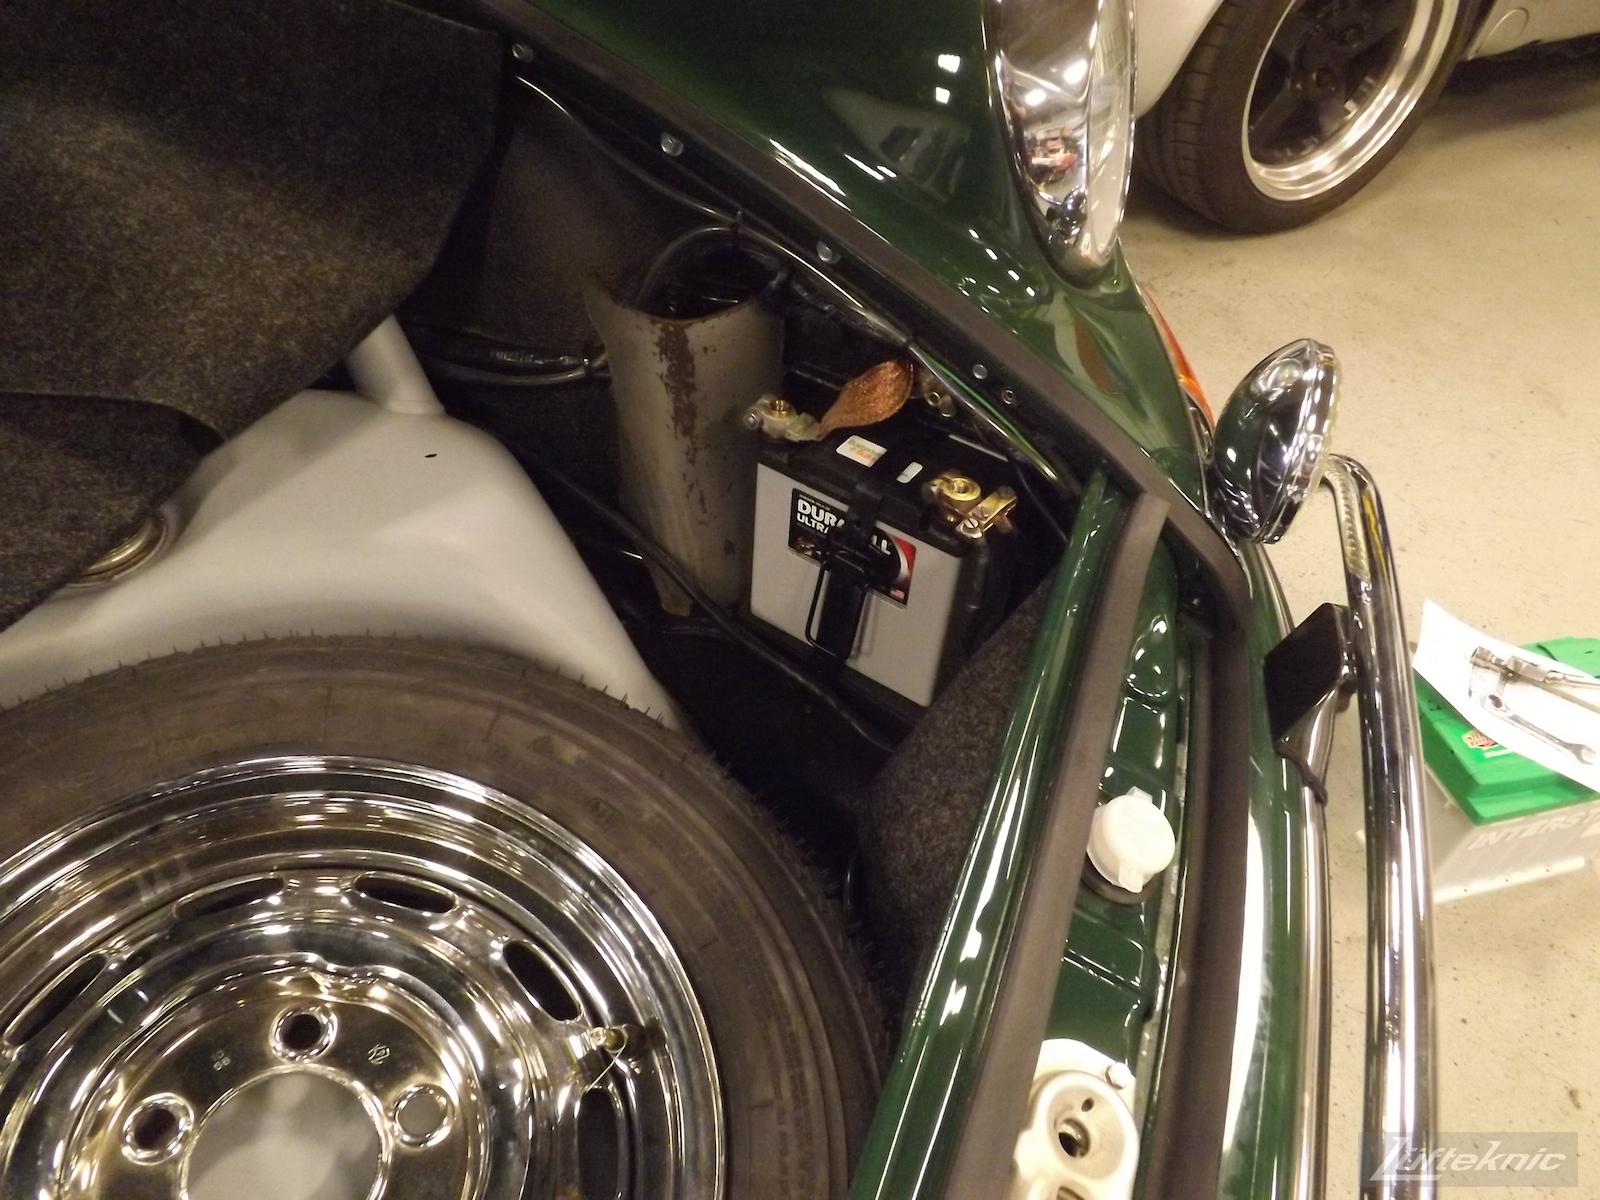 Newly installed battery and lights under the hood of an Irish Green Porsche 912 undergoing restoration at Lufteknic.